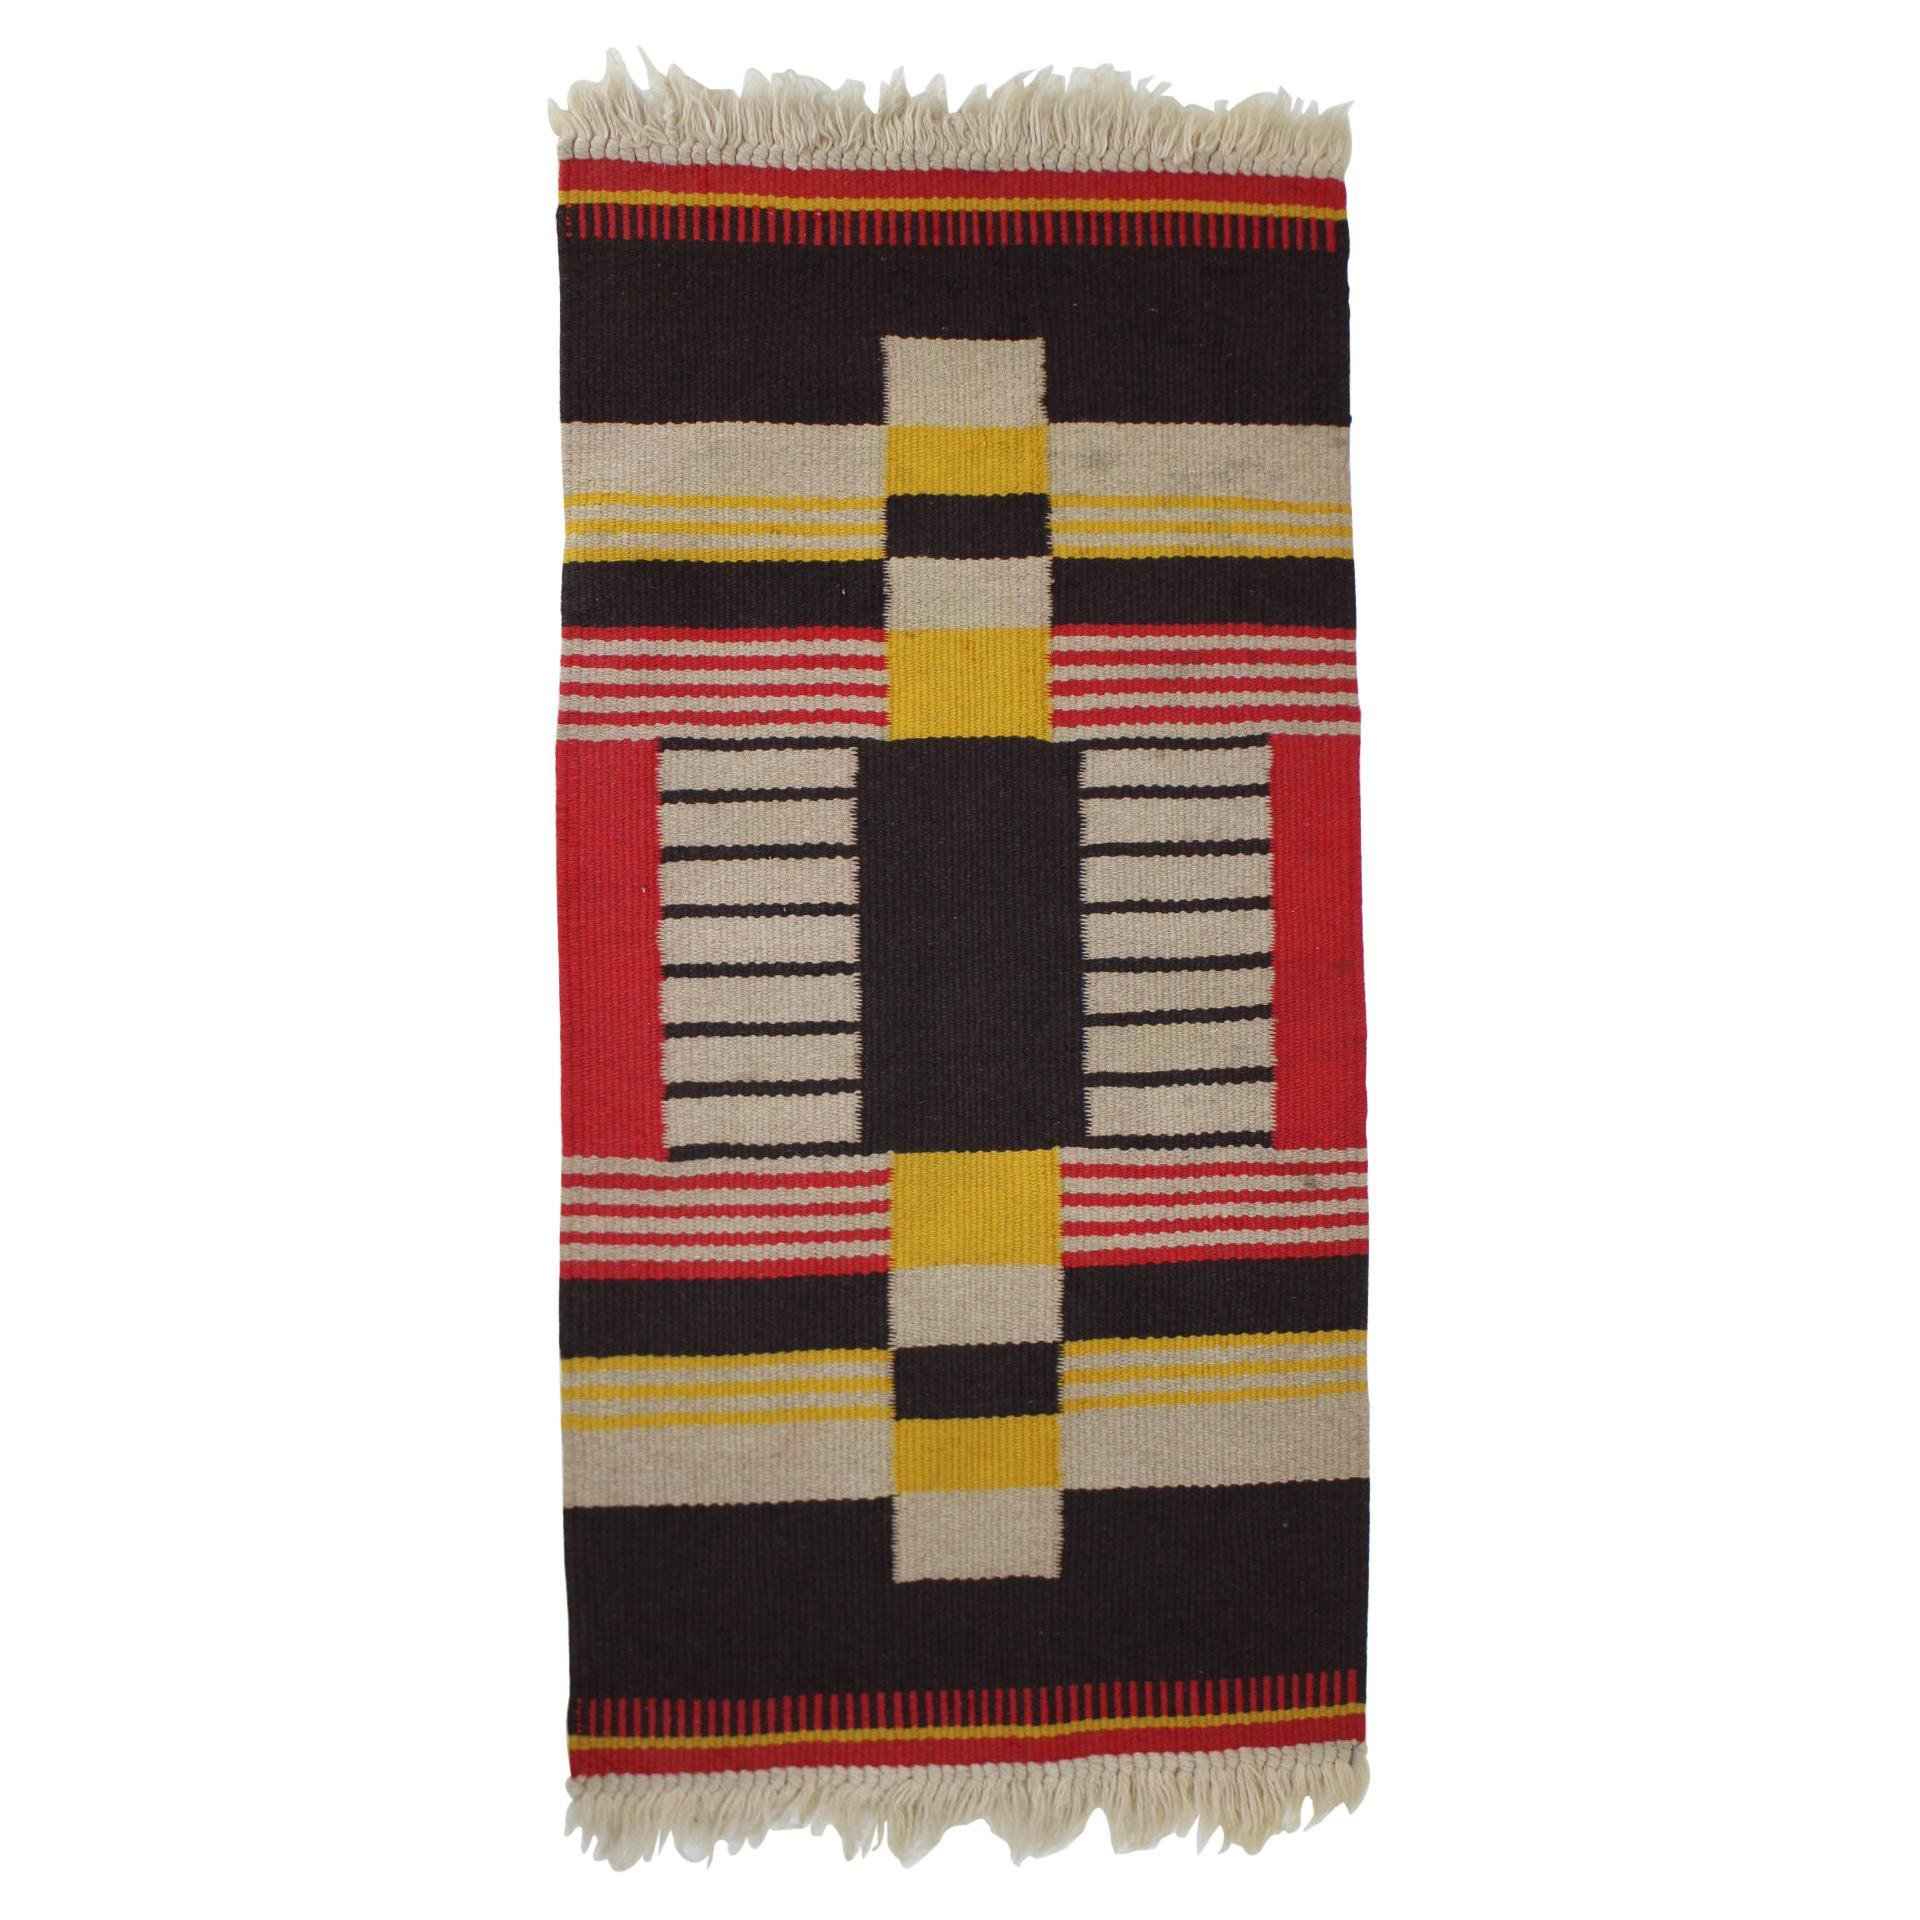 Small Geometric Wool Kilim Carpet Designed by Antonin Kybal, 1940s